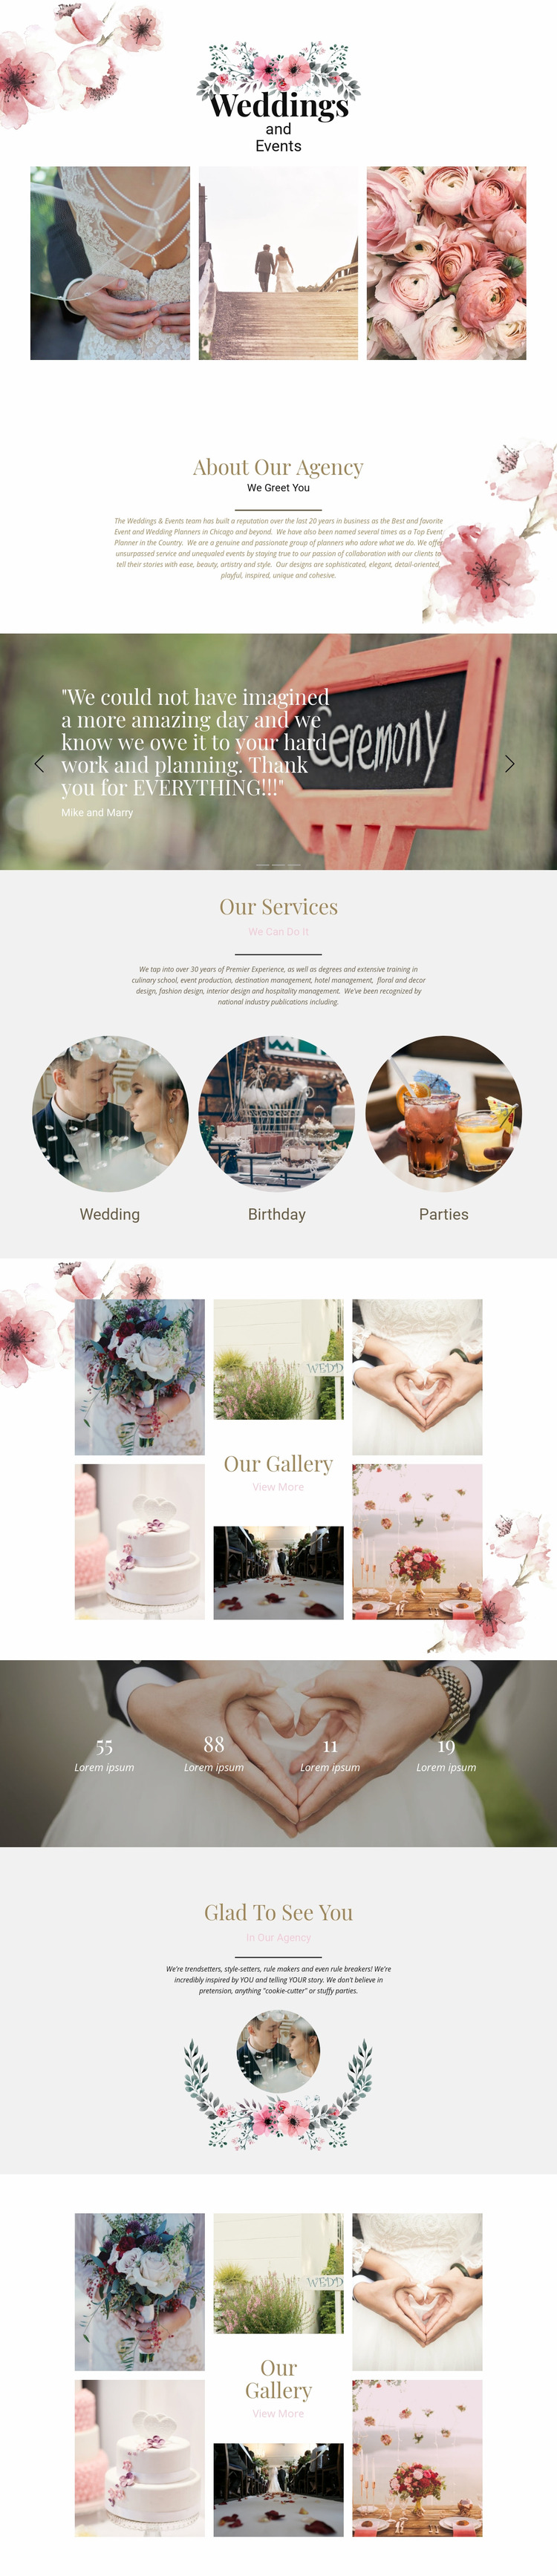 Moments of wedding Website Maker